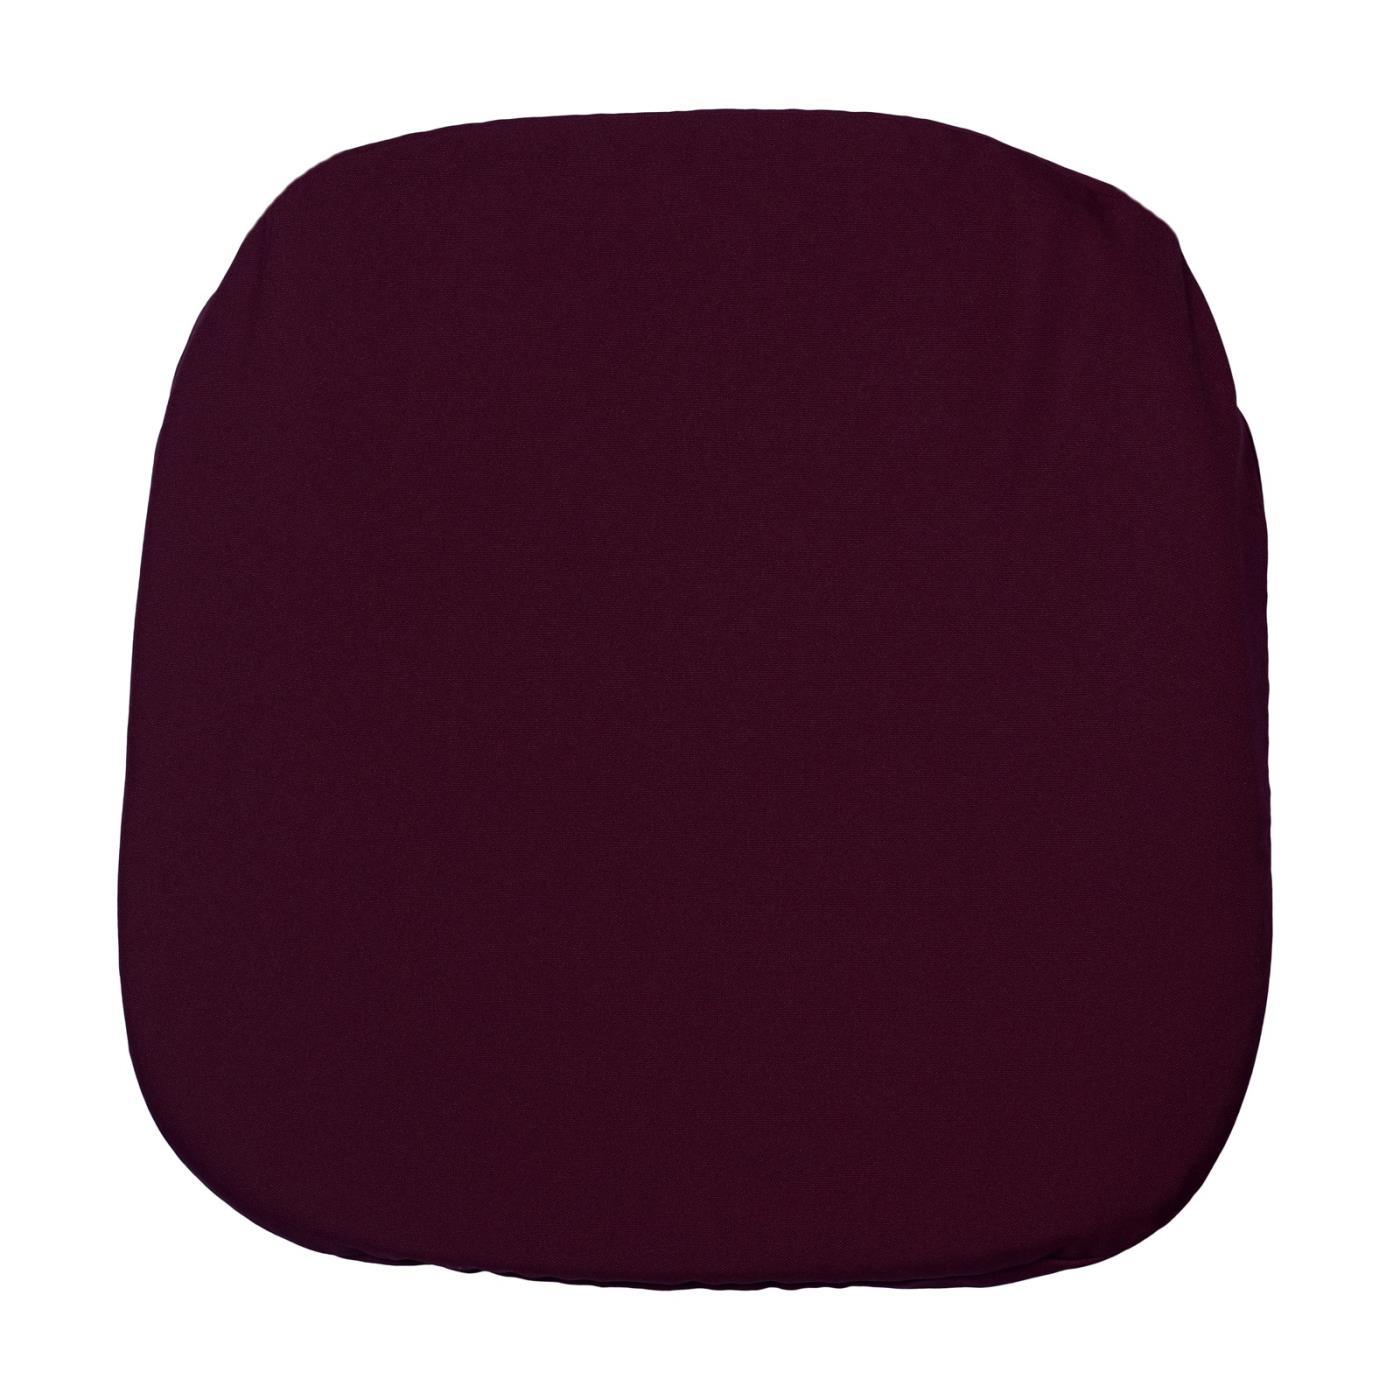 Poly Seat Cushion - Burgundy